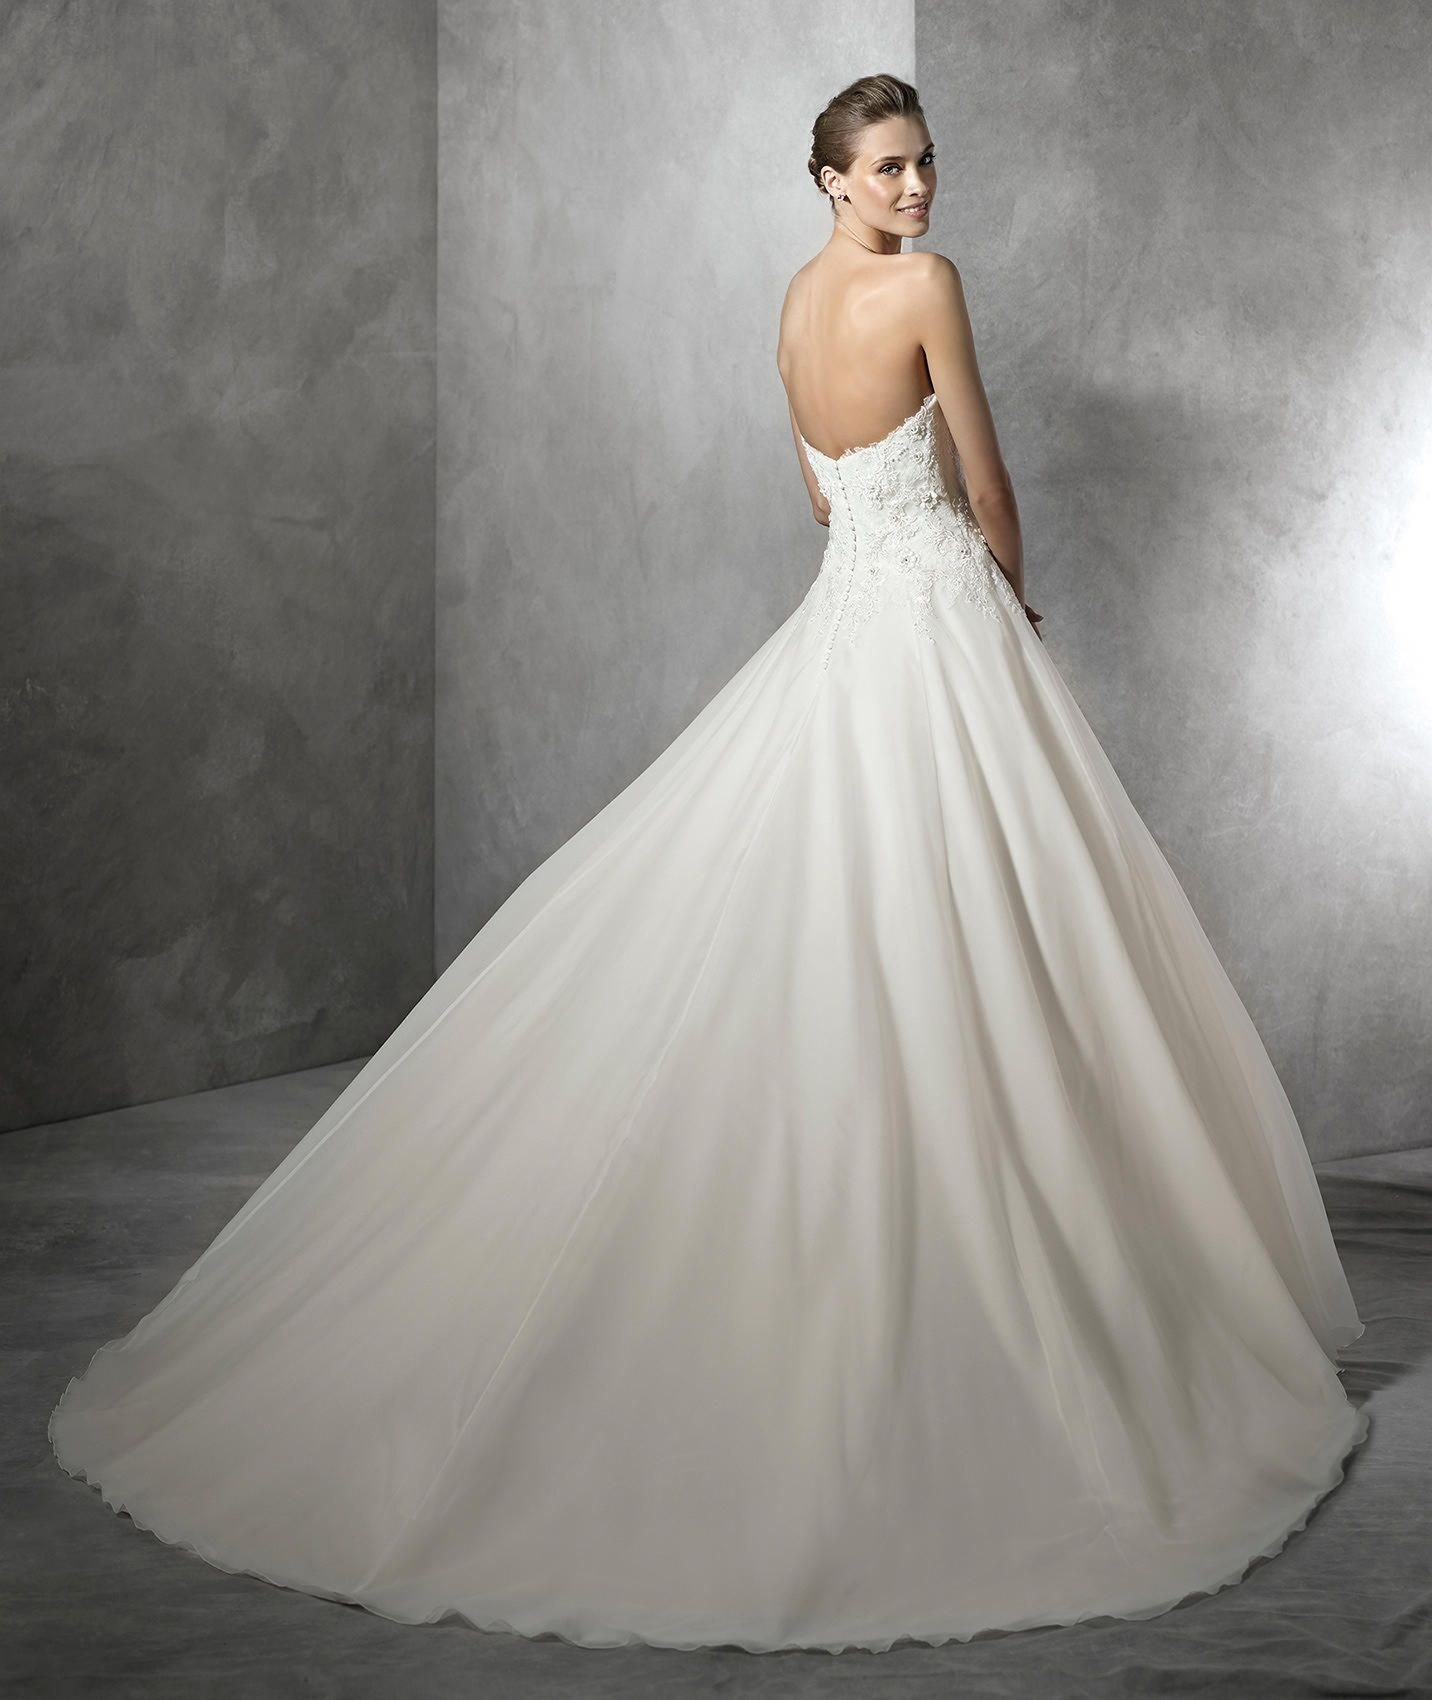 Silhouette wedding dresses simple bridal  TENDY  Robe de mariée simple silhouette sirène  Pronovias